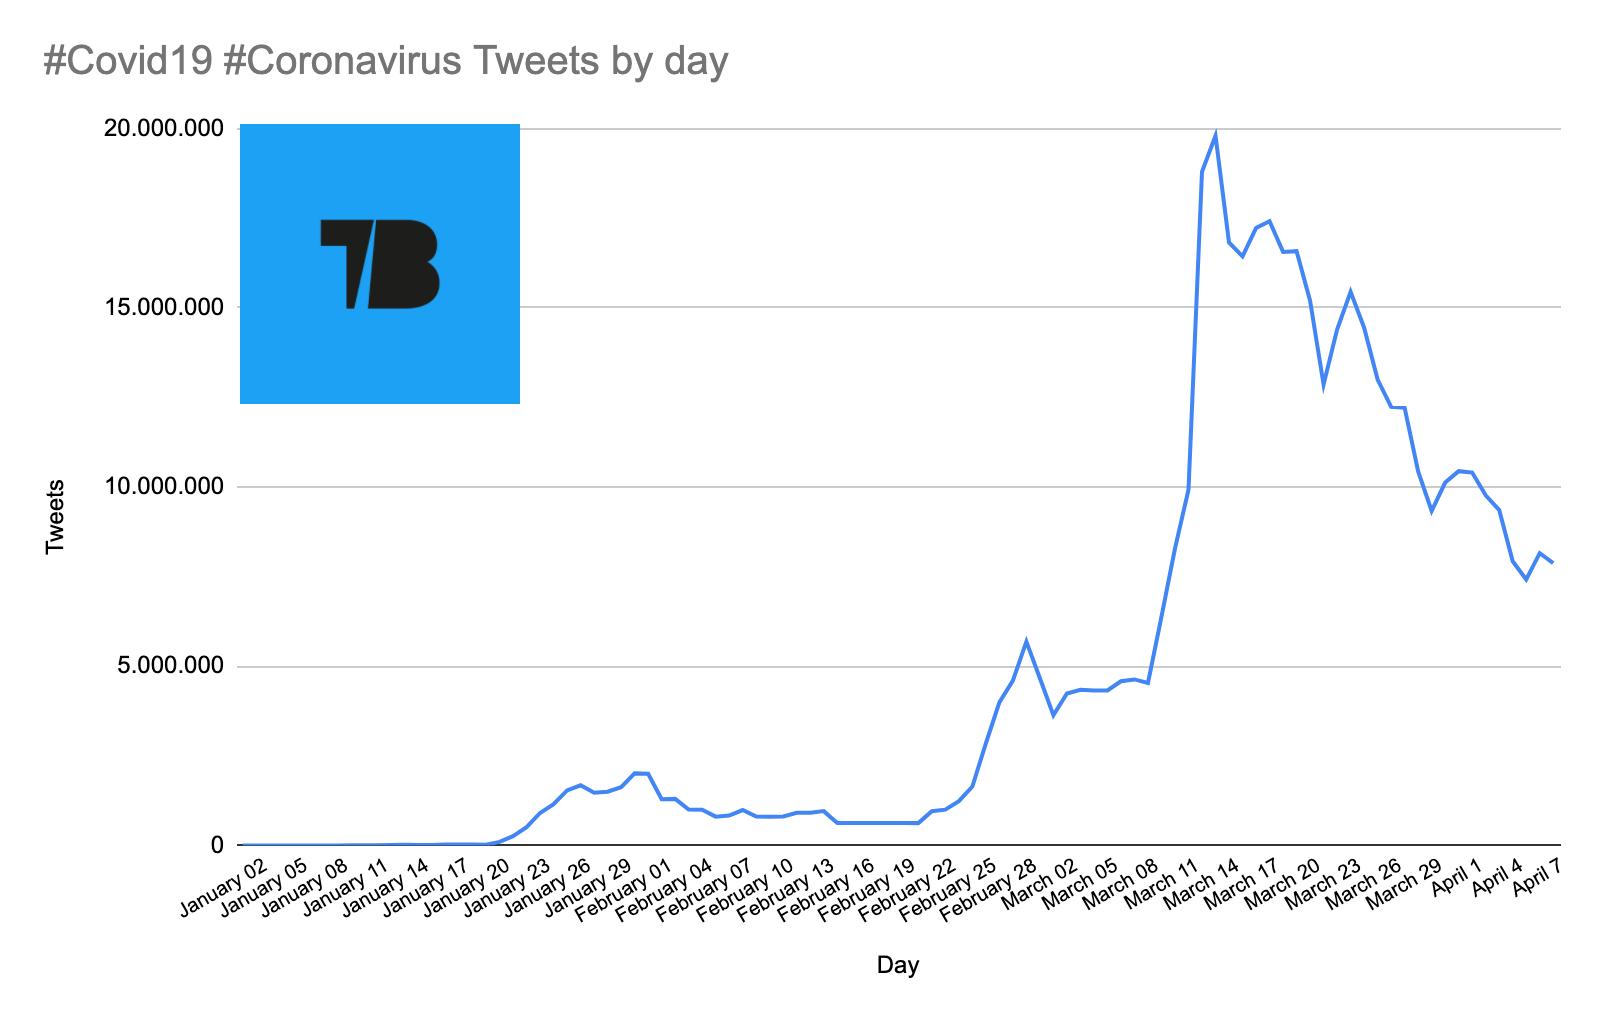 Evolution of the Coronavirus on Twitter in 2020